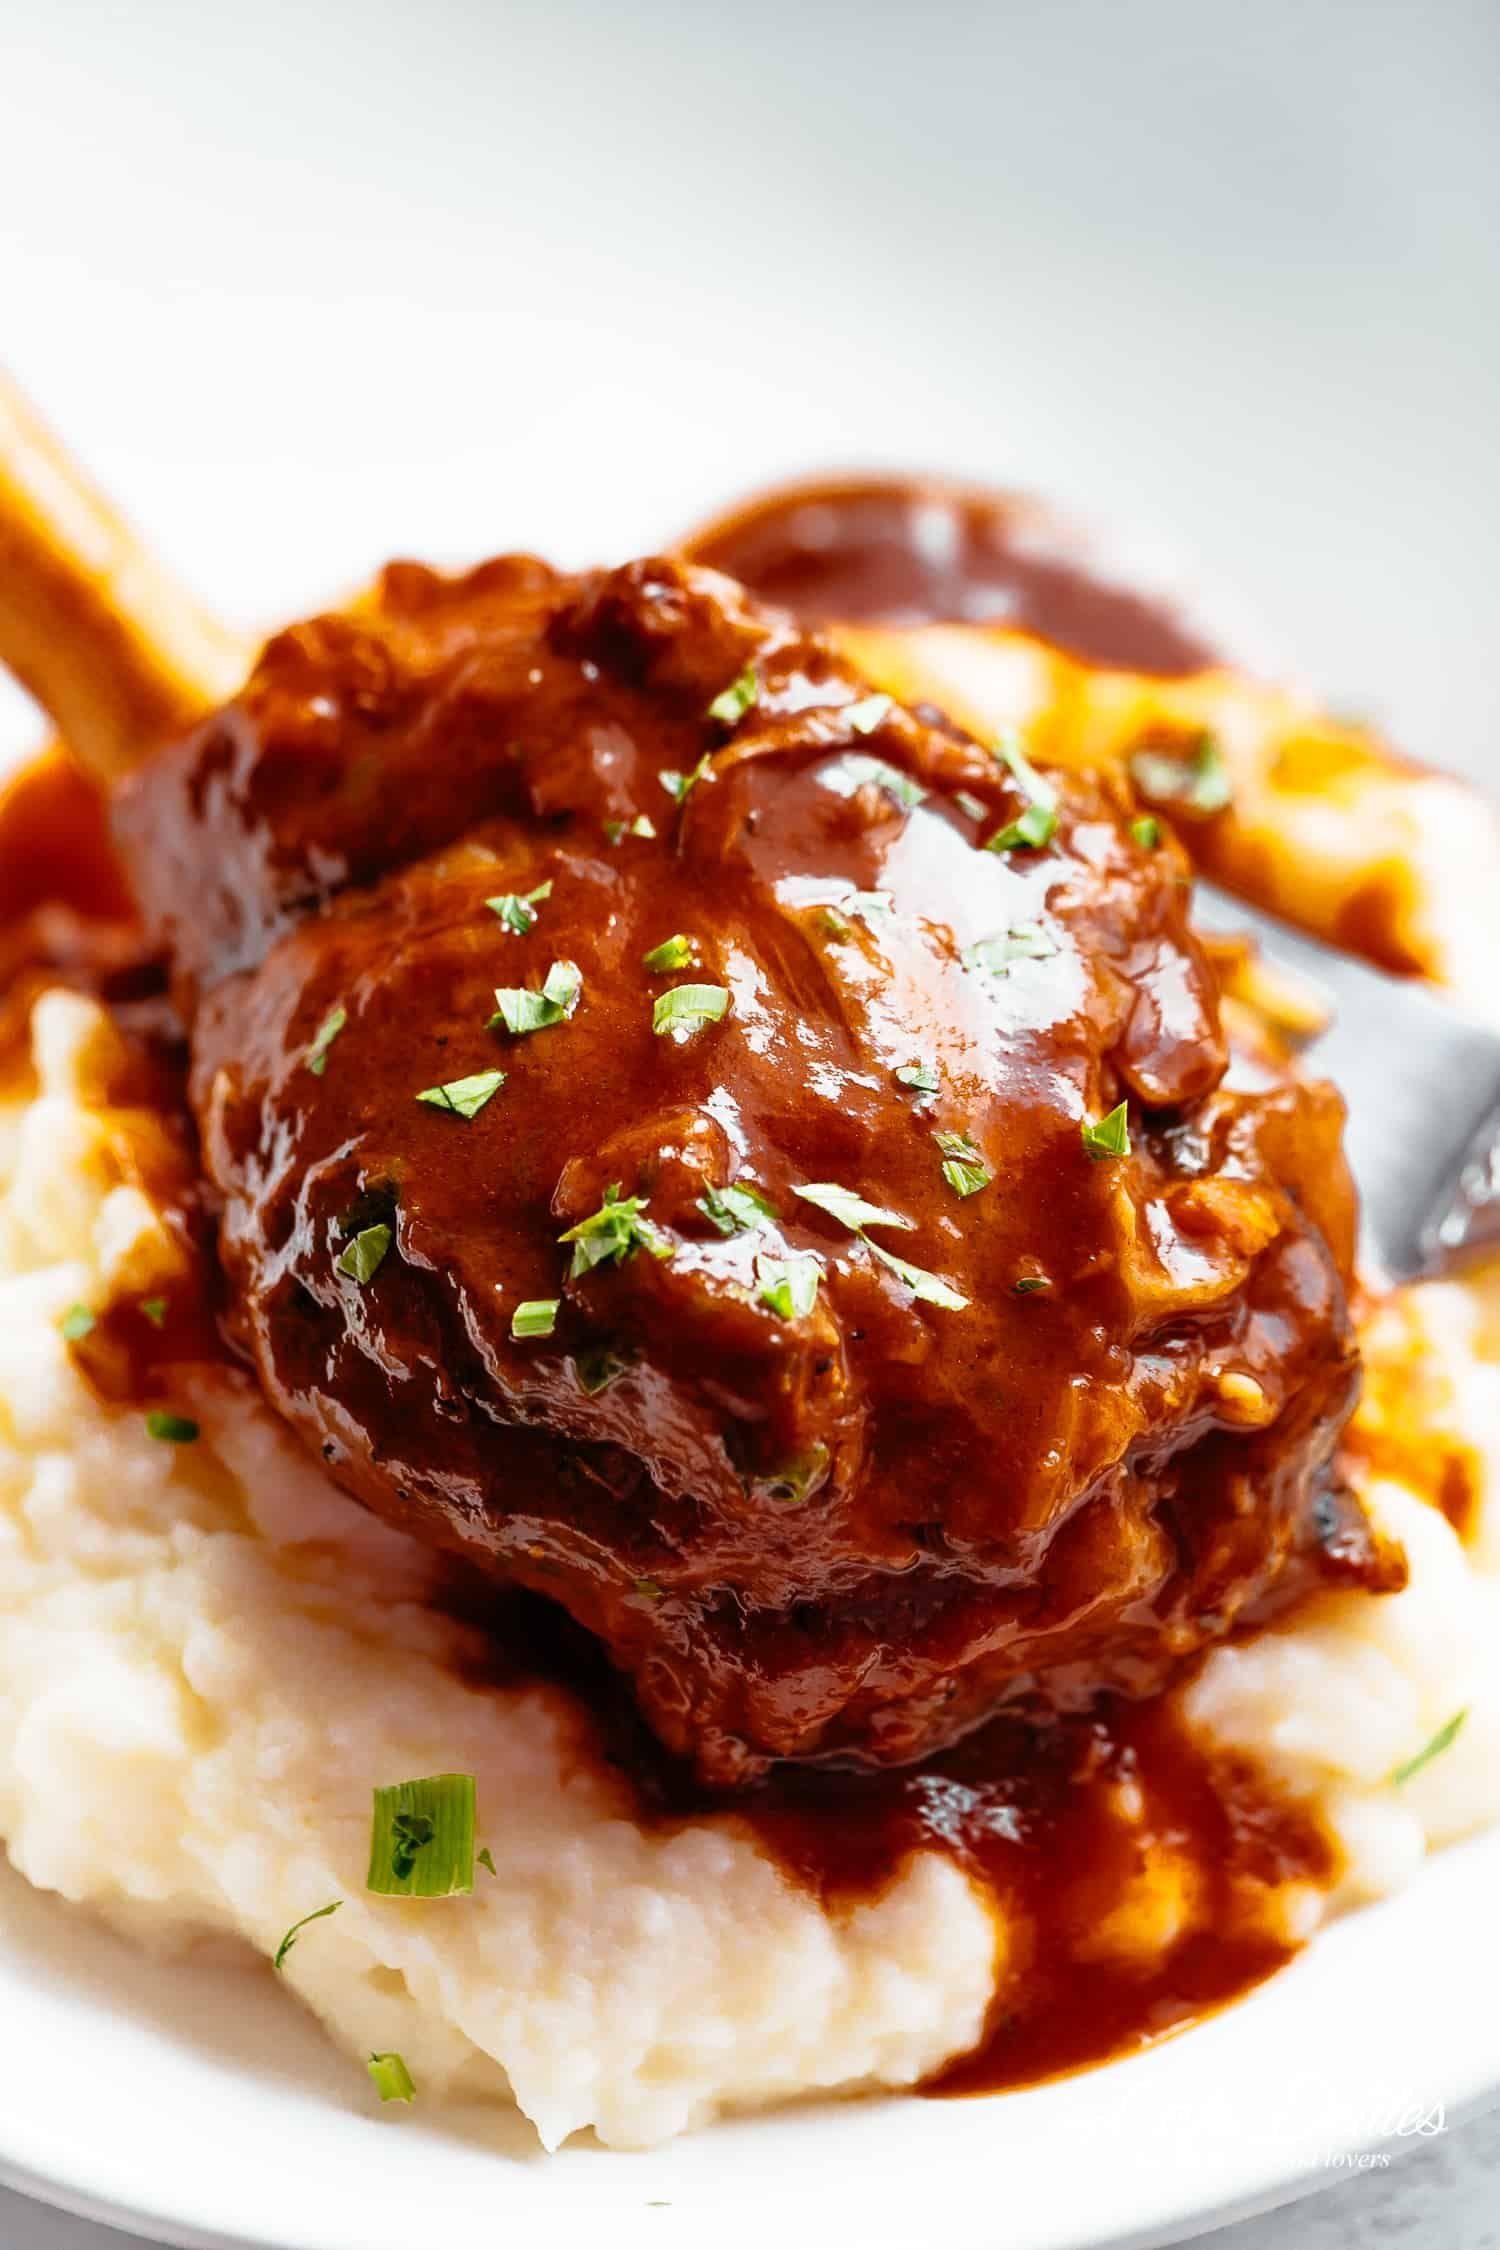 Tender Lamb Shank Served With Mashed Potatoes Cafedelites Com Lamb Shank Recipe Braised Lamb Braised Lamb Shanks